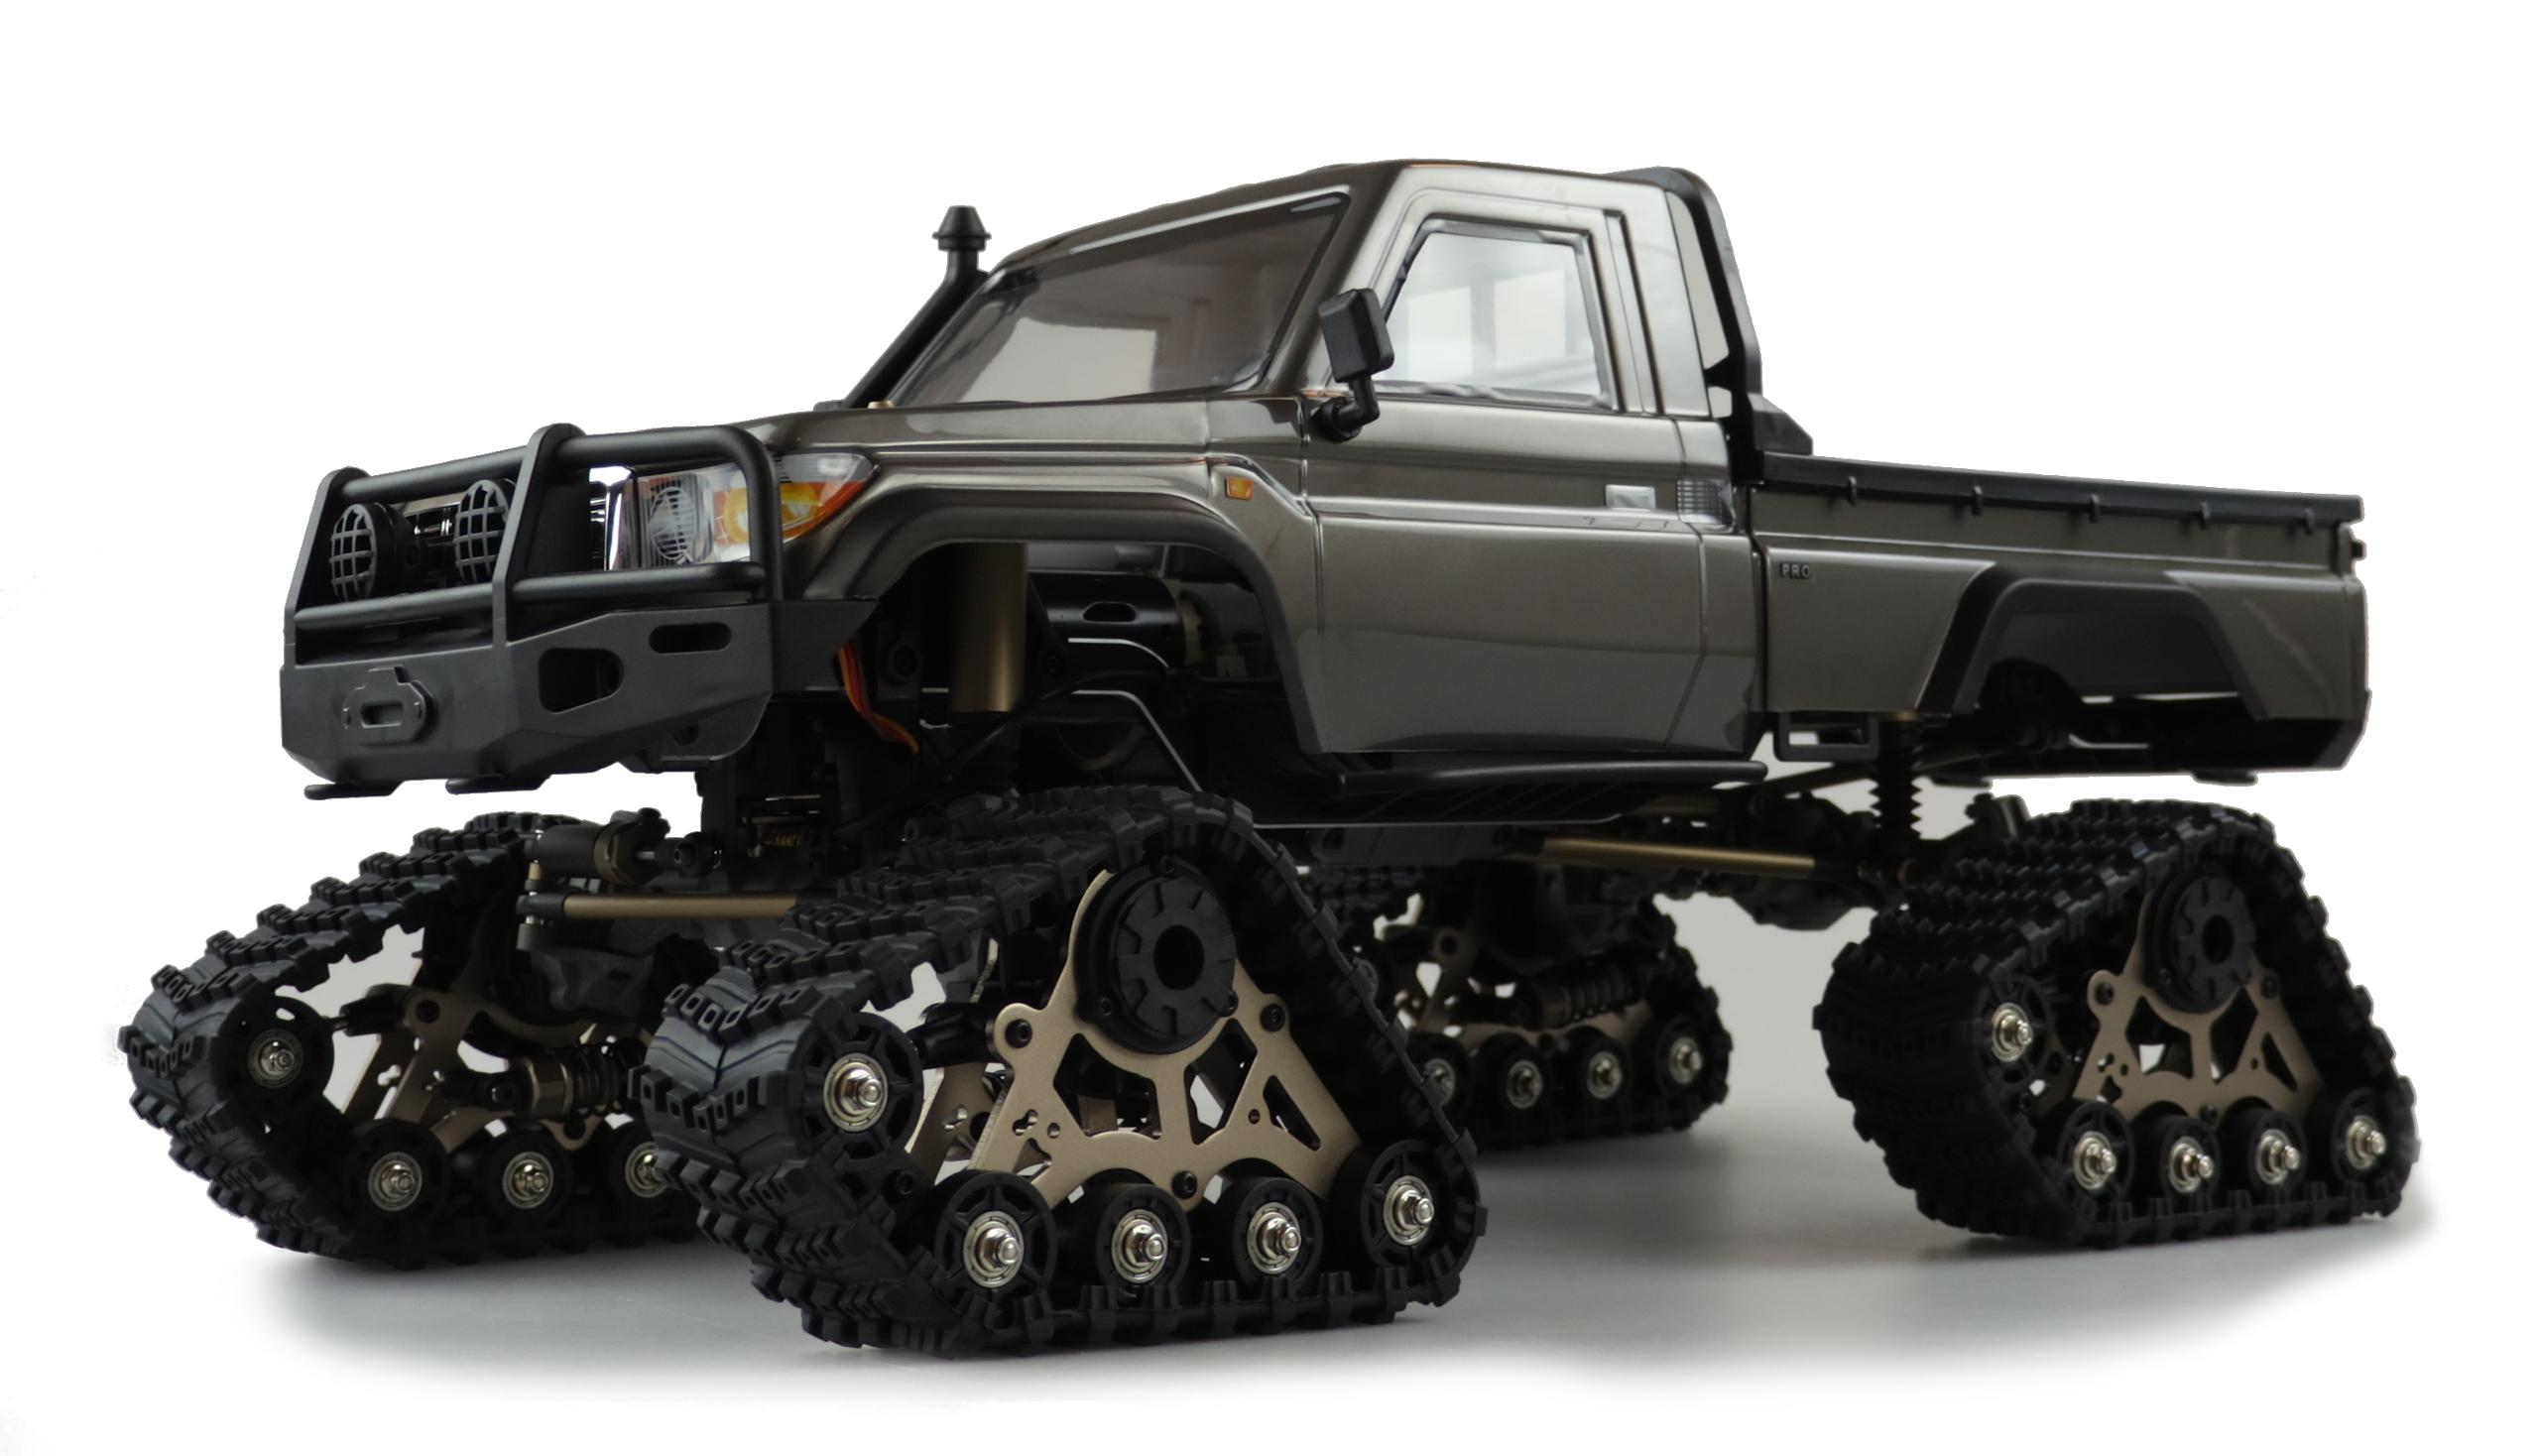 Amewi 22459 - Raupenfahrzeug - Elektromotor - 1:10 - Betriebsbereit (RTR) - Schwarz - Aluminium - Metall